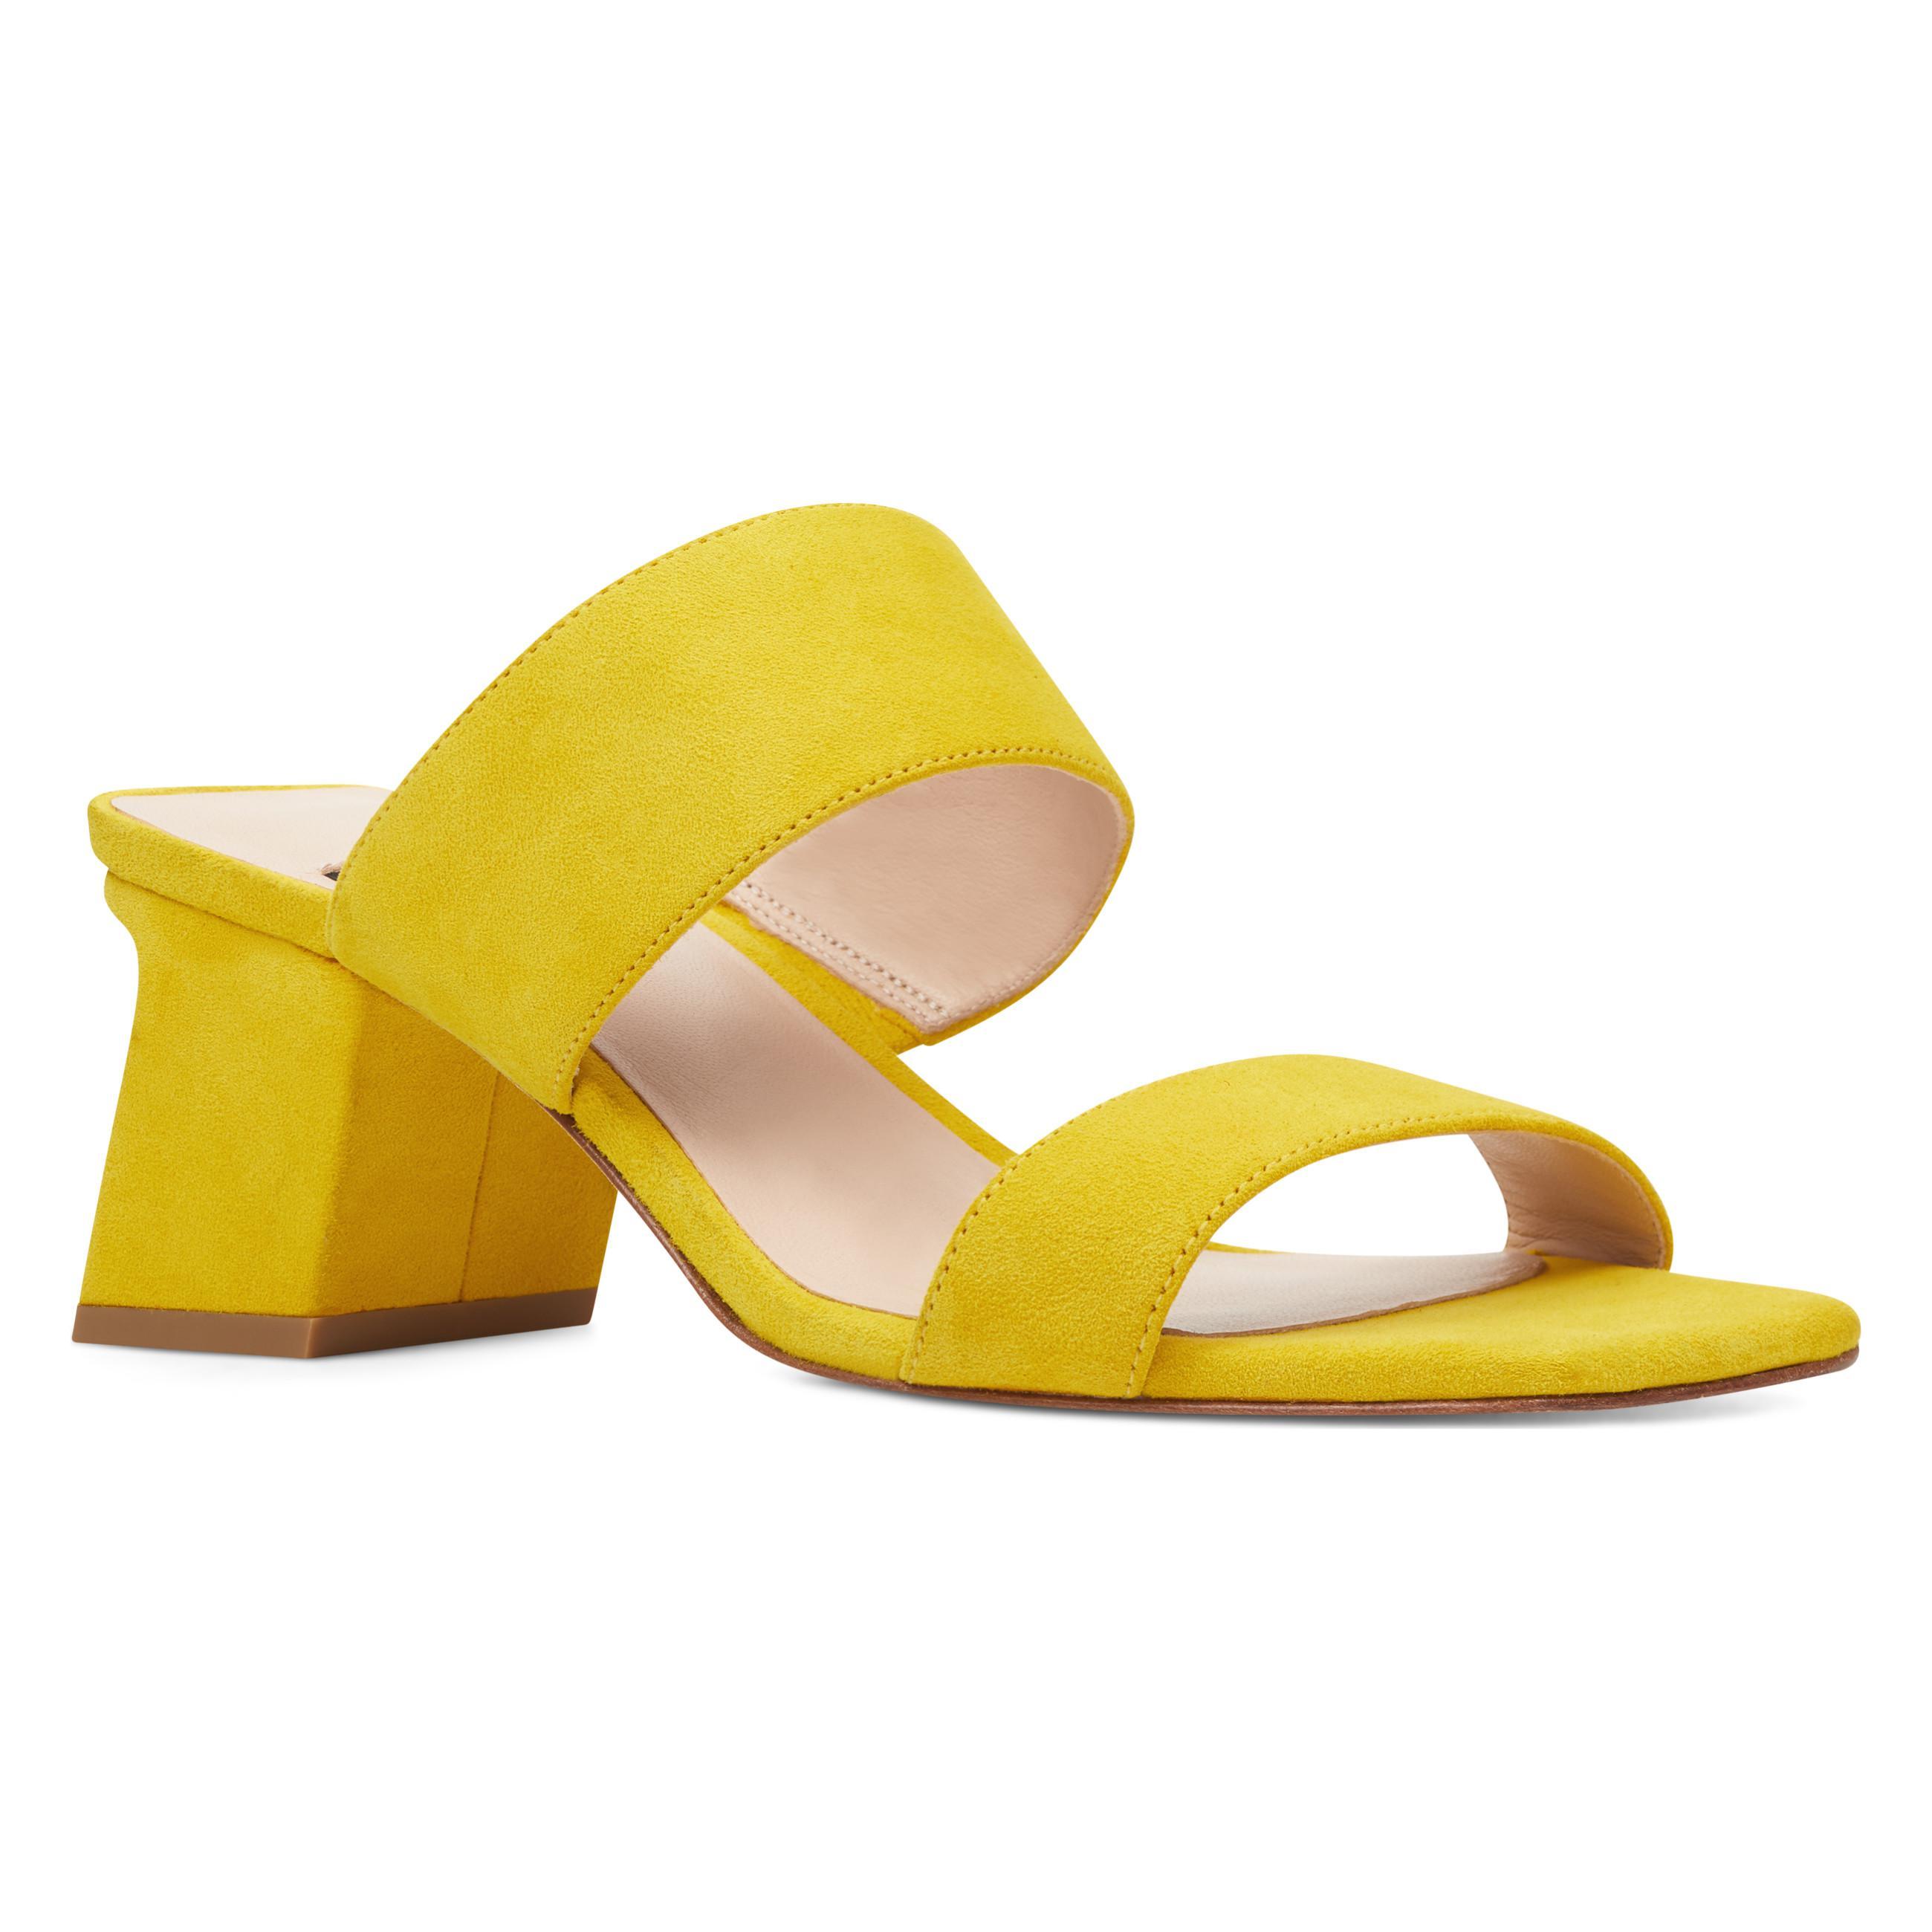 b57c46c326dc Nine West - Yellow Churen Double Strap Mule Sandals - Lyst. View fullscreen